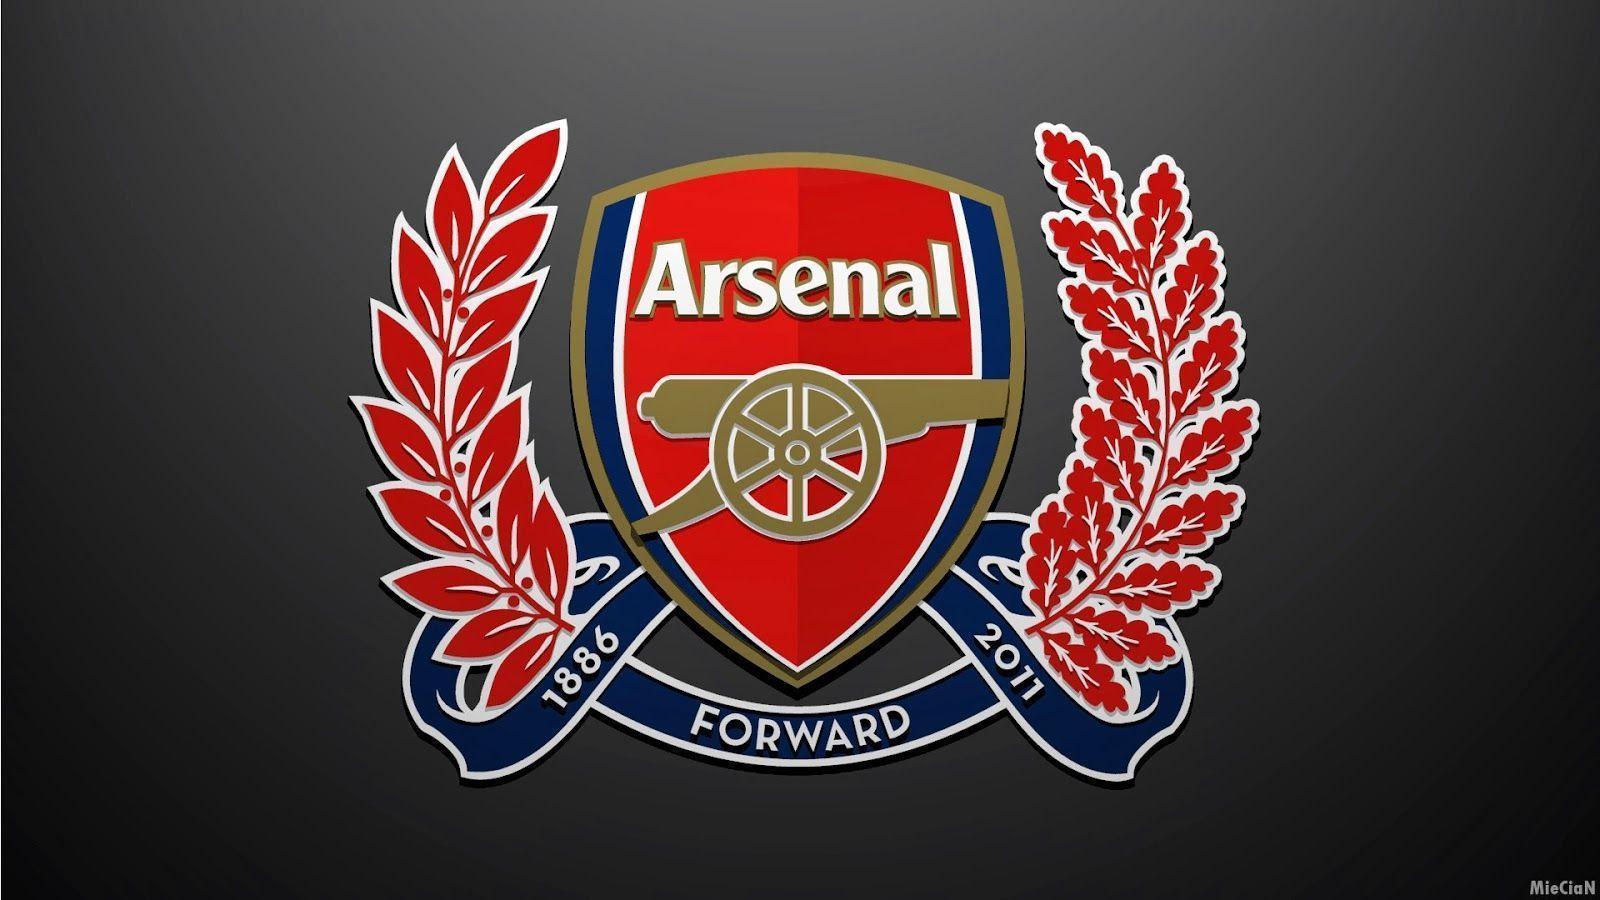 Arsenal Logo Wallpapers 2015 - Wallpaper Cave